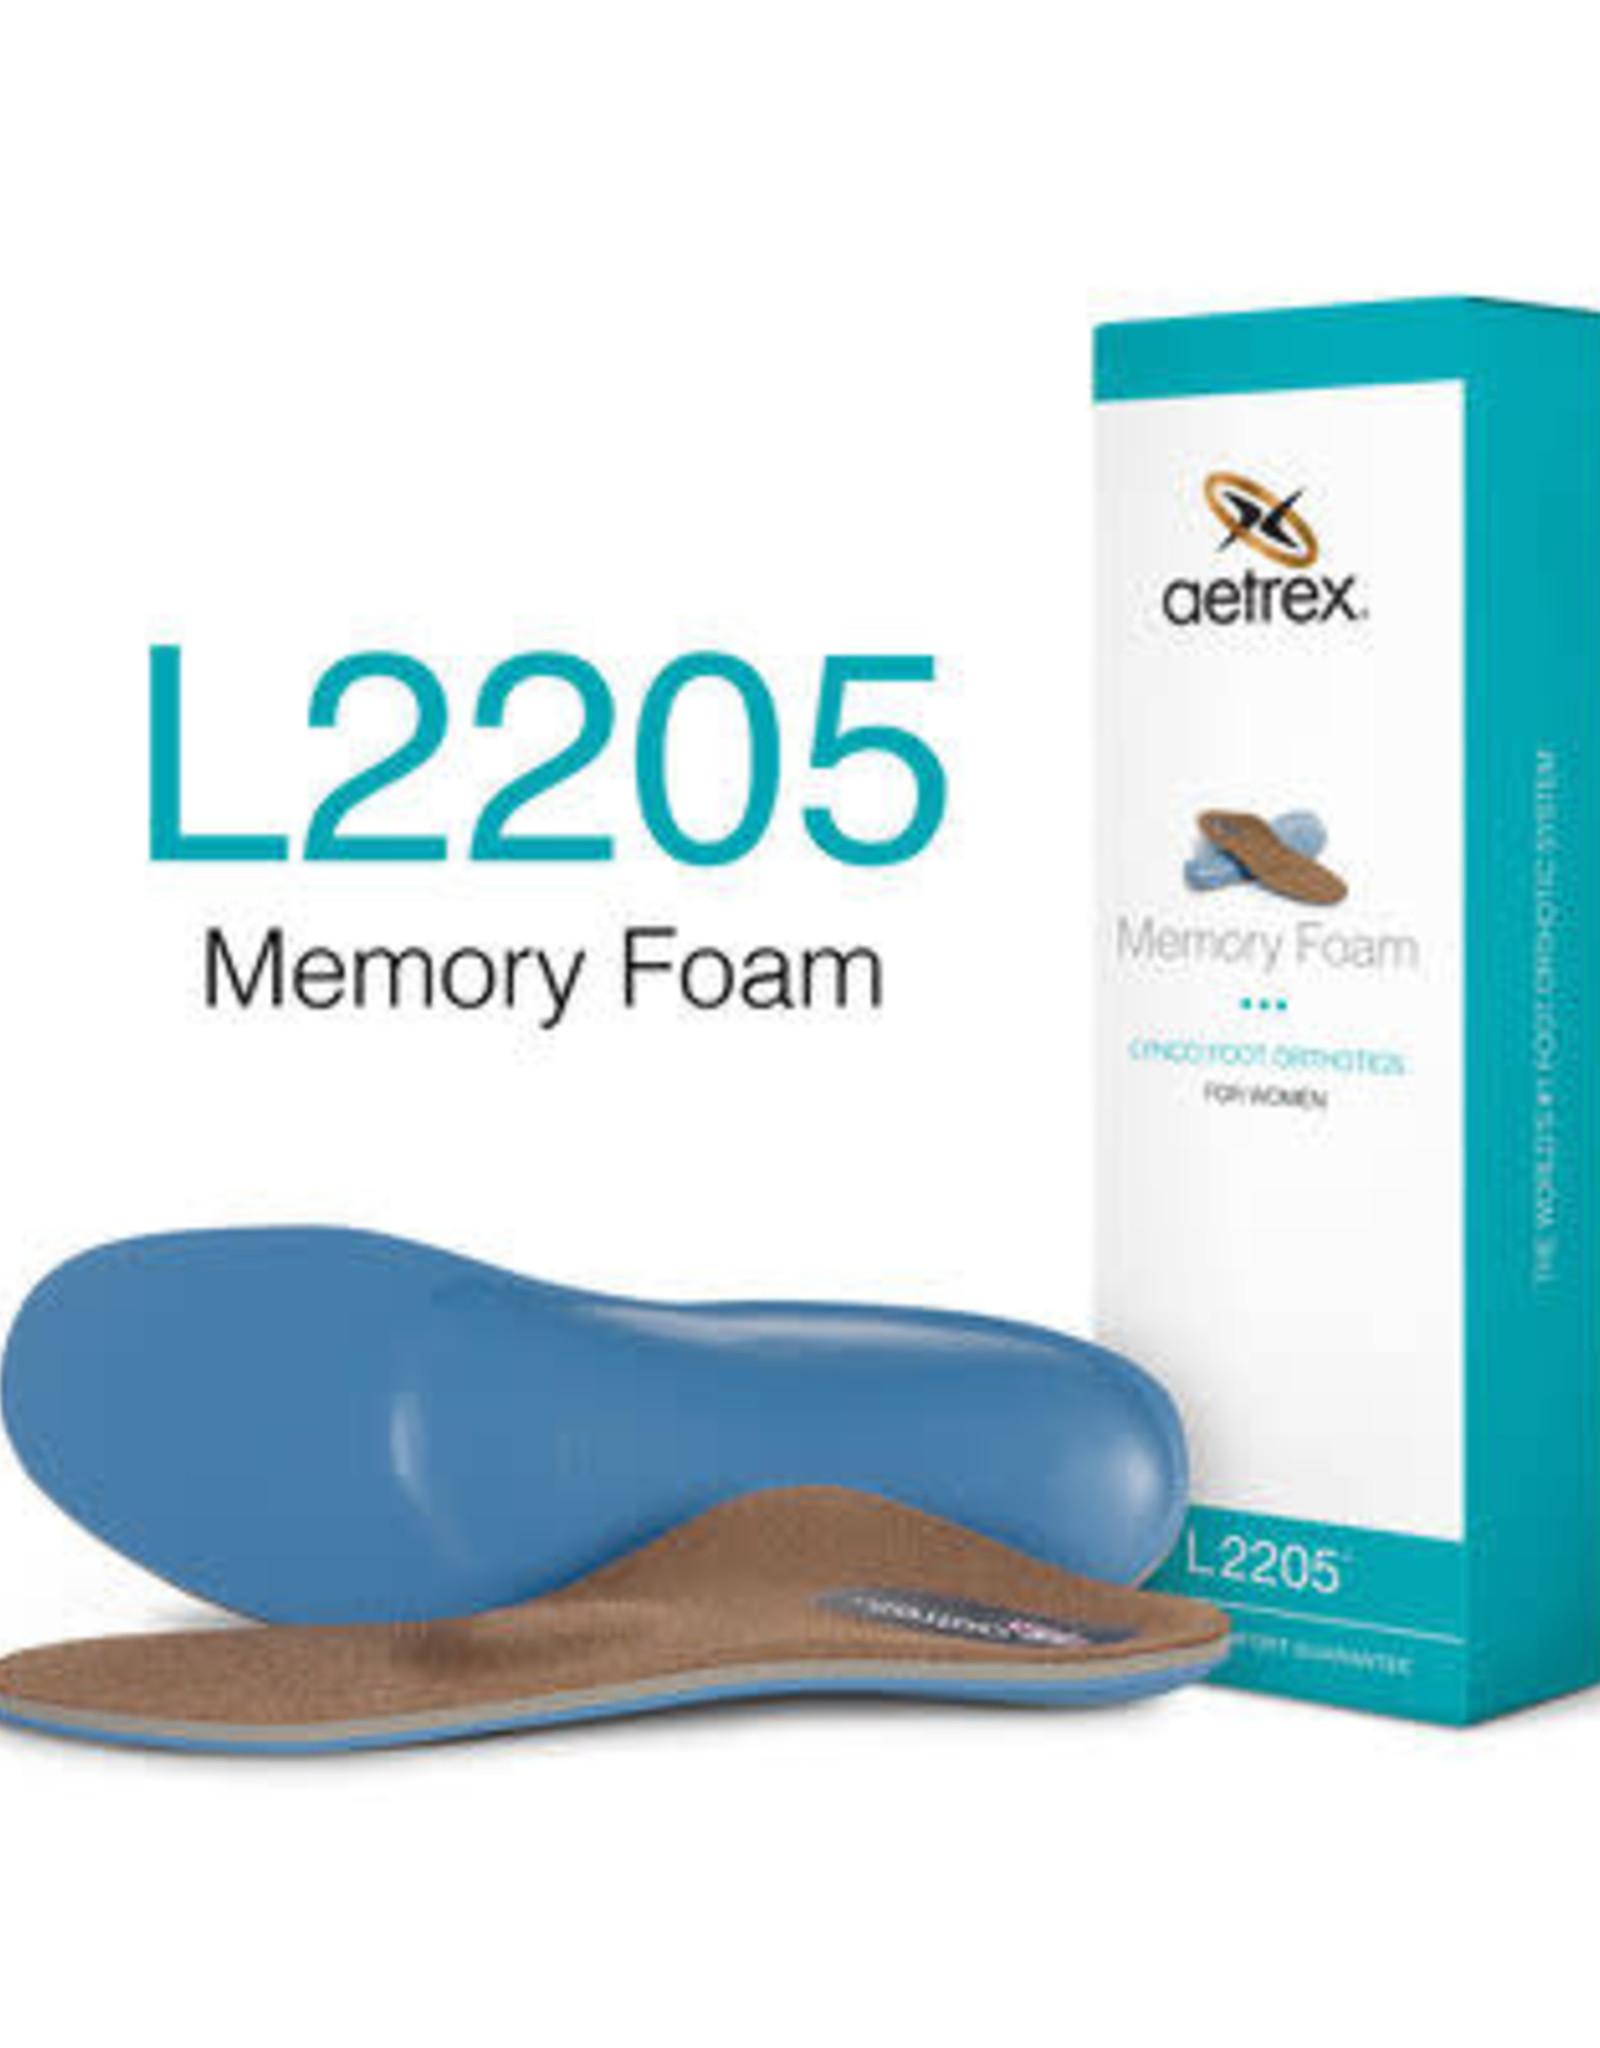 Aetrex M Foam L2205